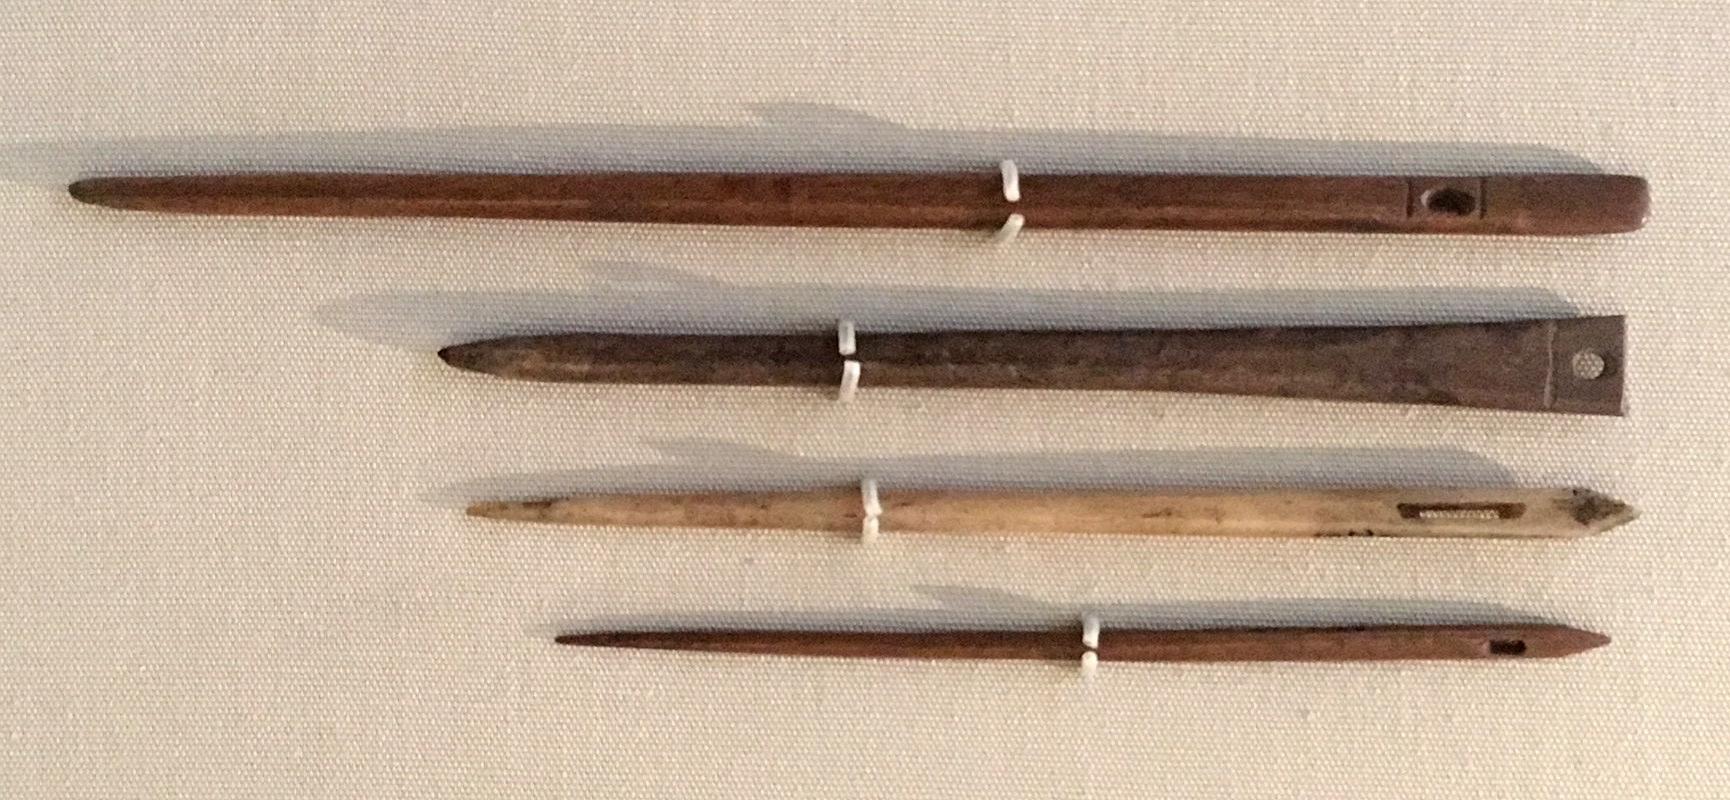 bm-needles.jpg